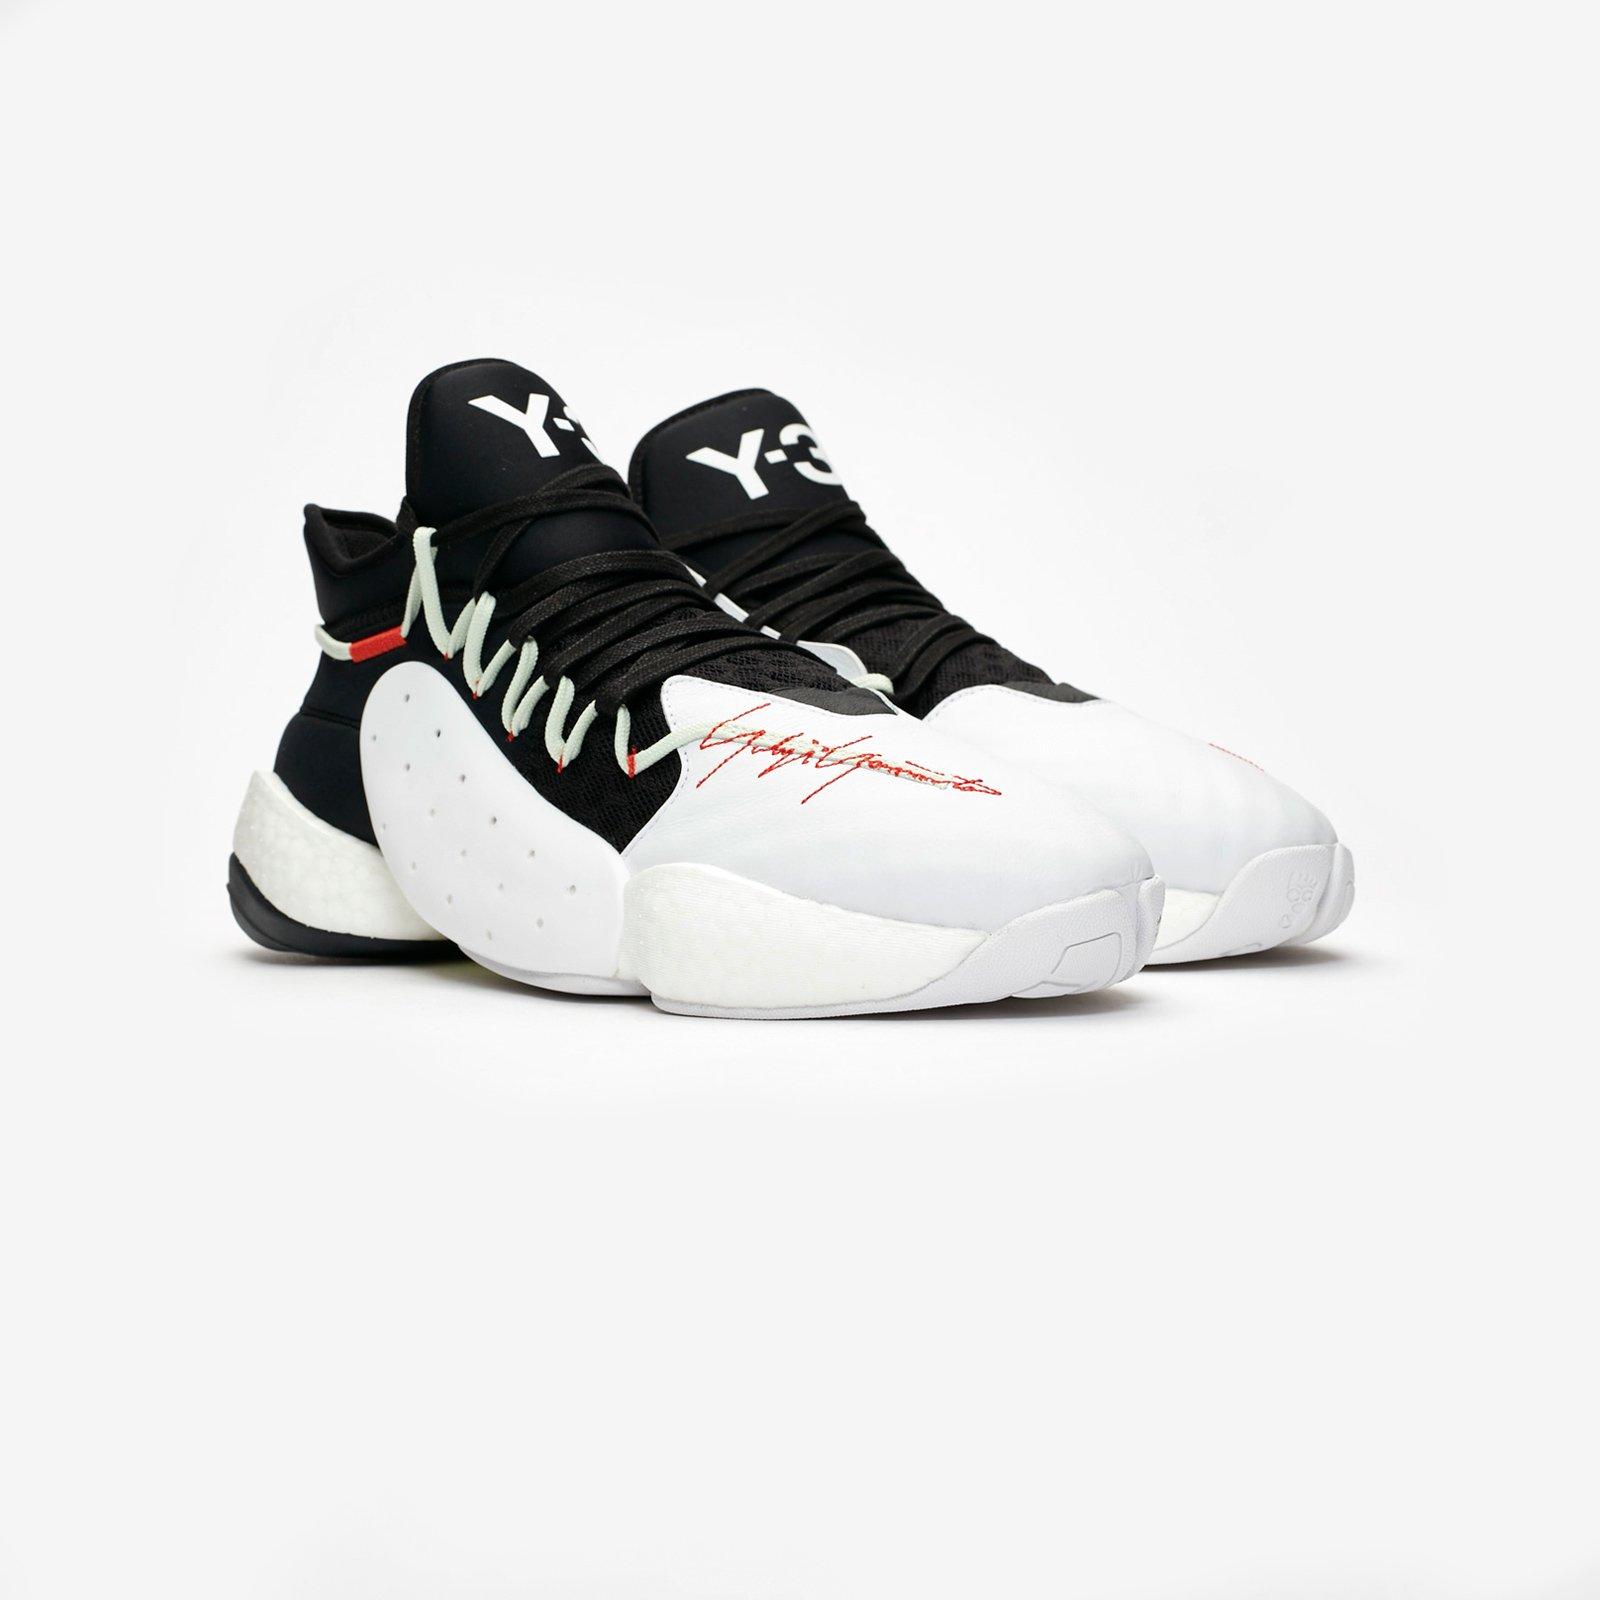 5b00329d160528 adidas BYW Bball - F99806 - Sneakersnstuff